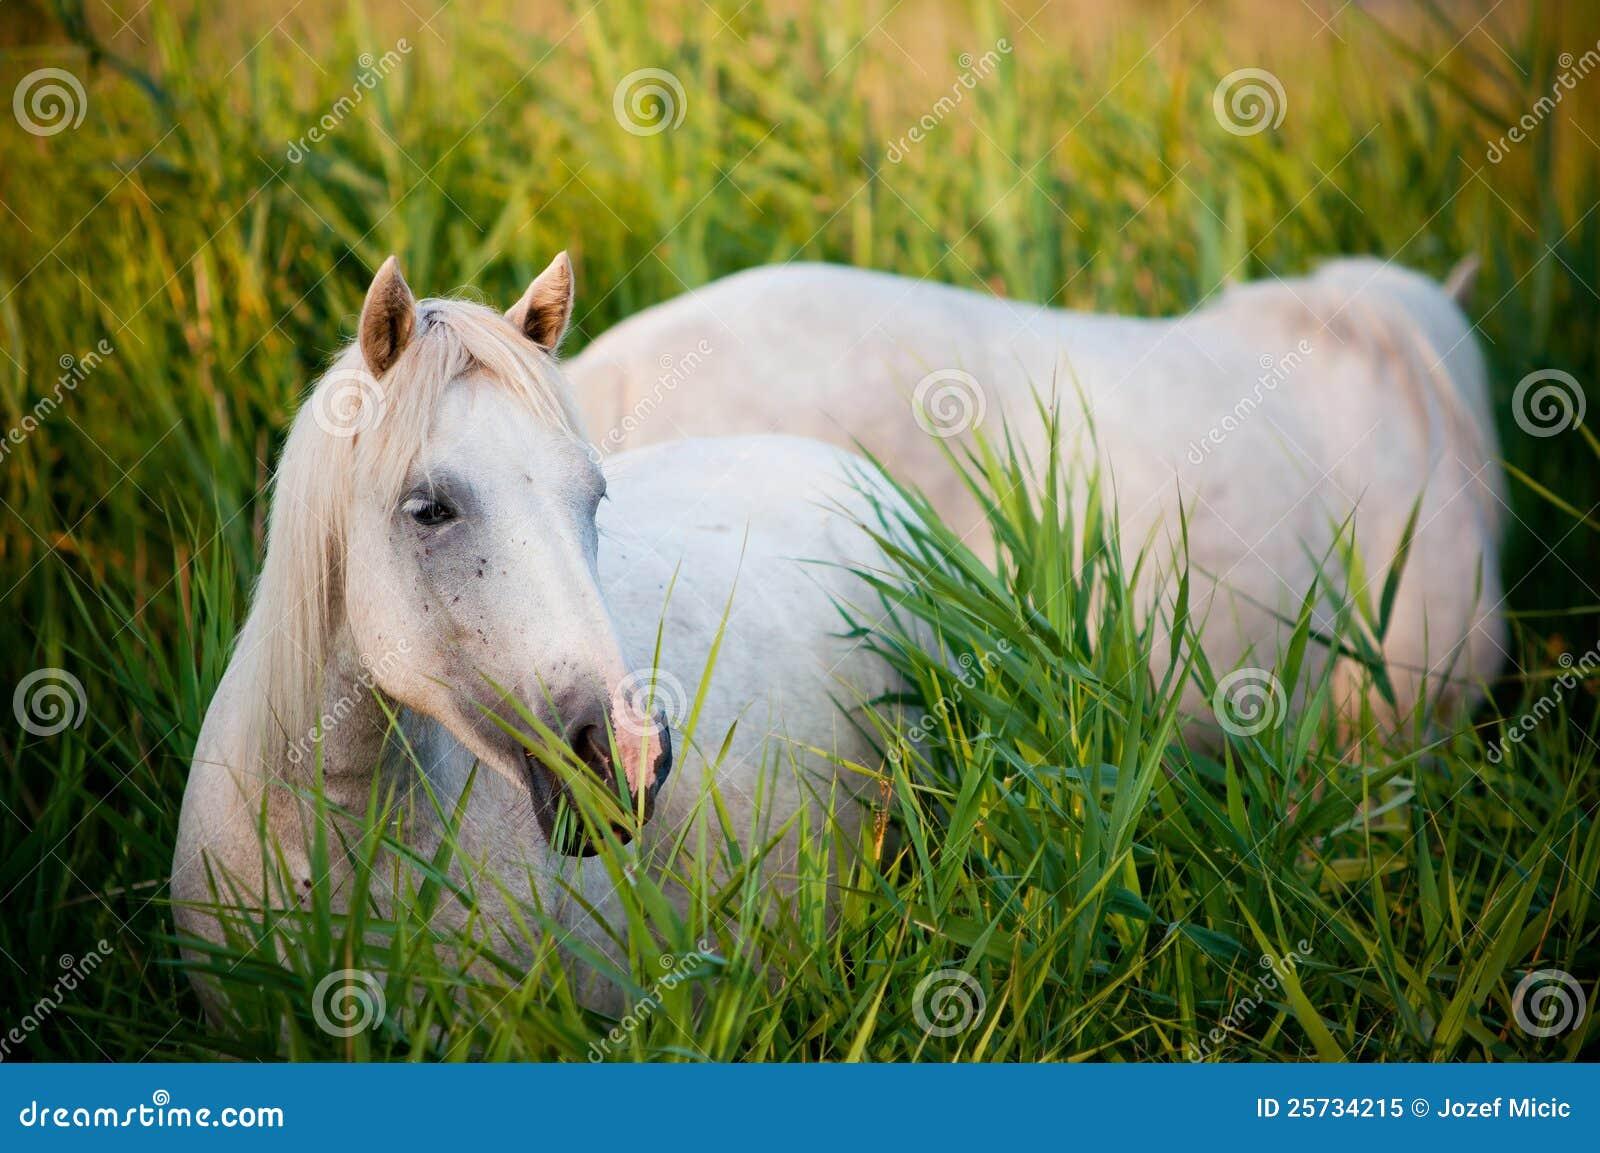 White horse eating grass - photo#6